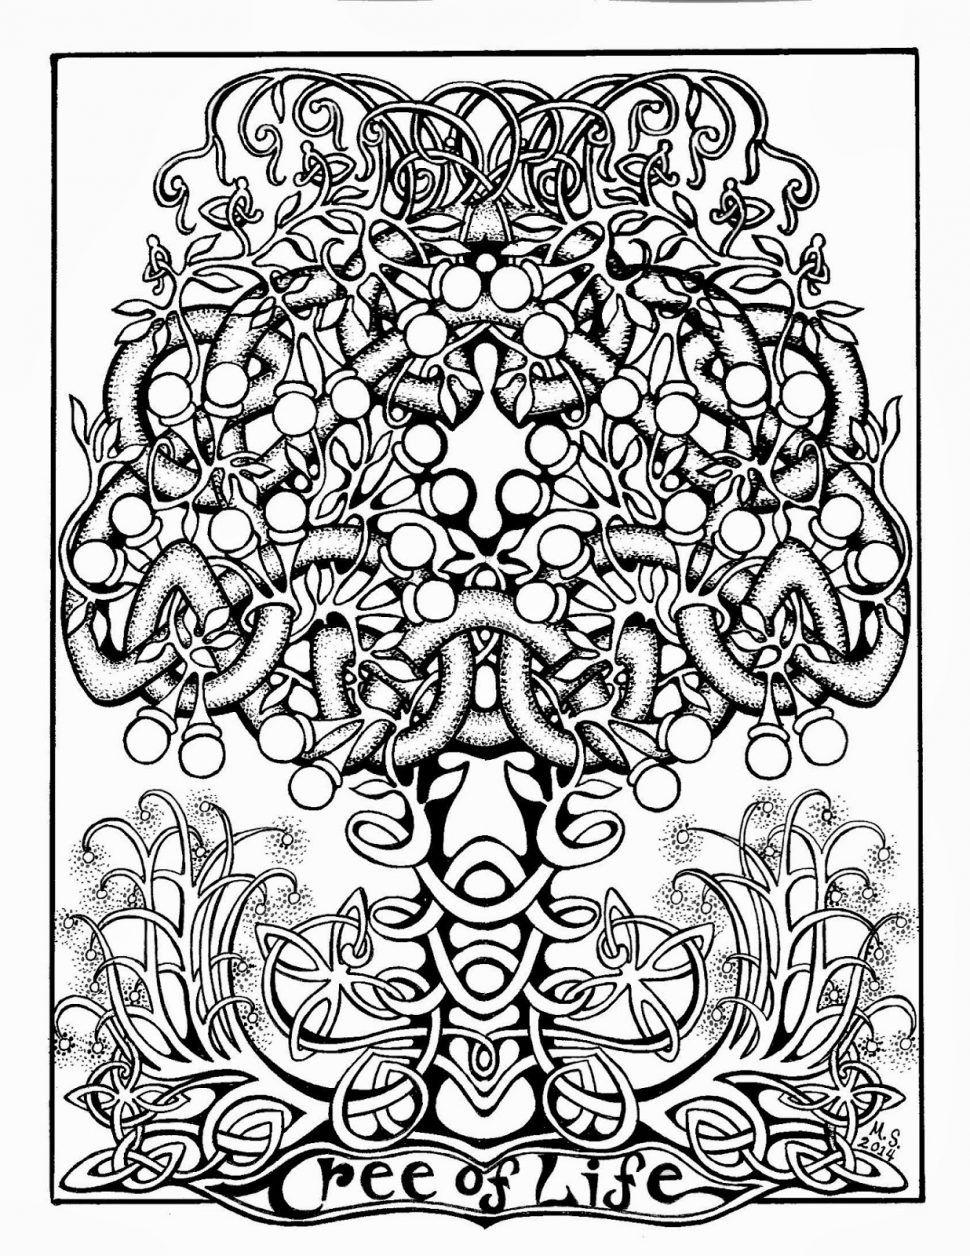 Grateful Dead Coloring Pages : grateful, coloring, pages, Grateful, Coloring, Bookadult, Deadmy, Celtic, Coloring,, Detailed, Pages,, Mandala, Pages